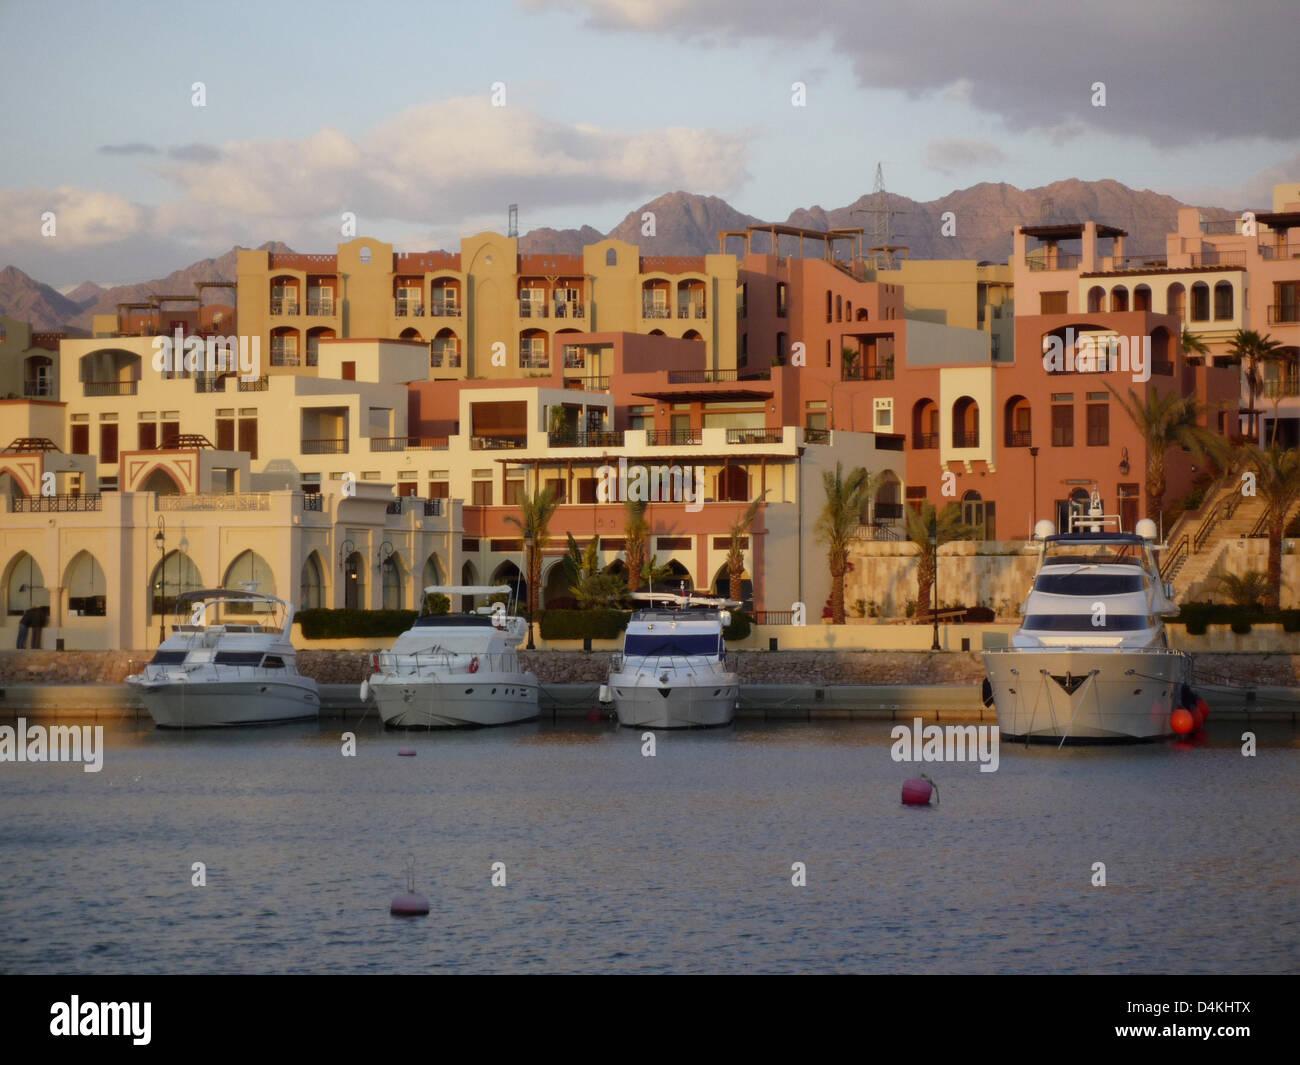 View on the waterfront Marina Plaza hotel in Aqaba, Jordan, 24 March 2009. Photo: Willy Matheisl - Stock Image